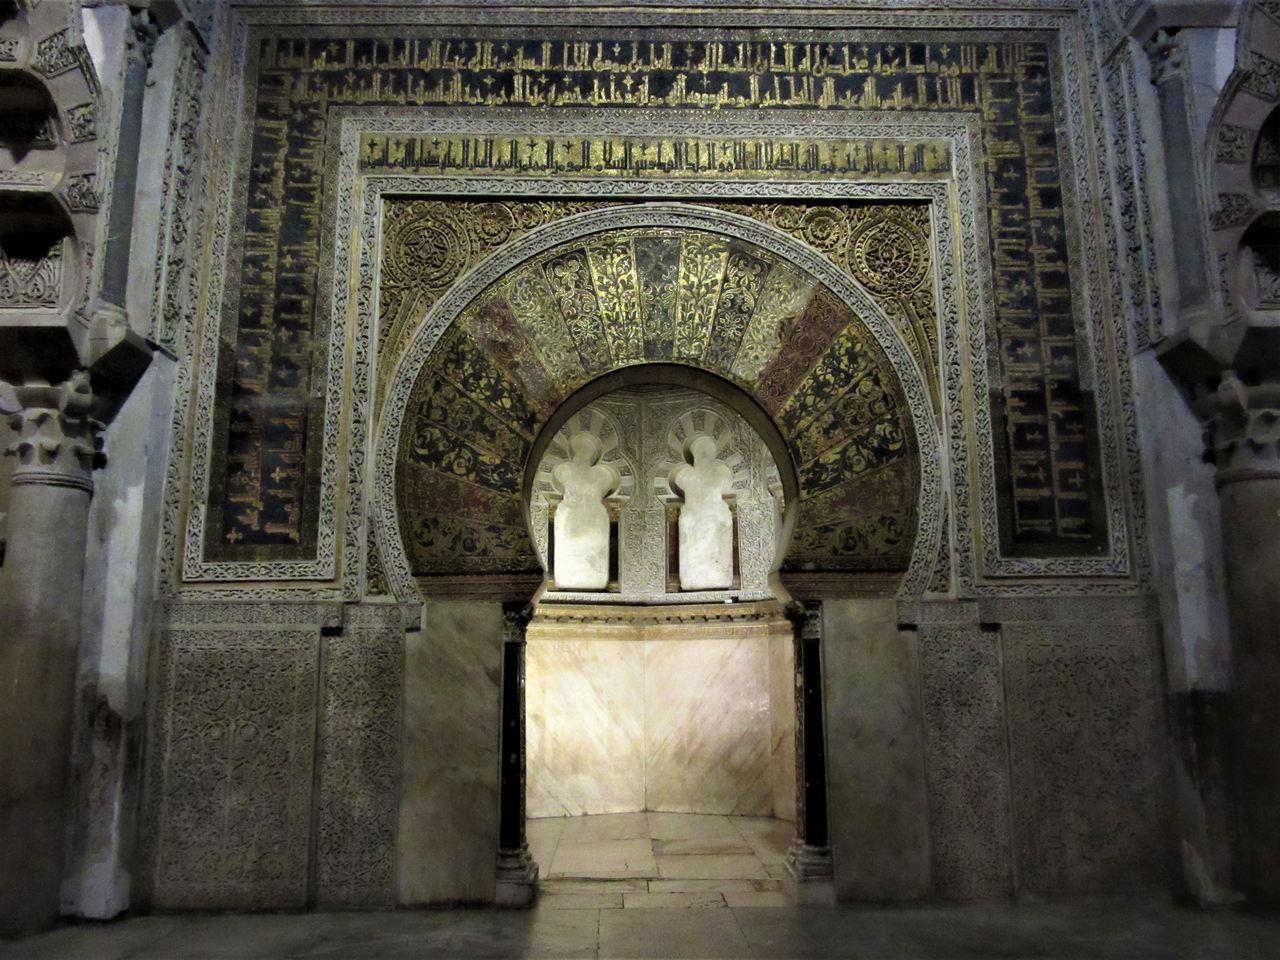 Mihrab Mezquita Córdoba